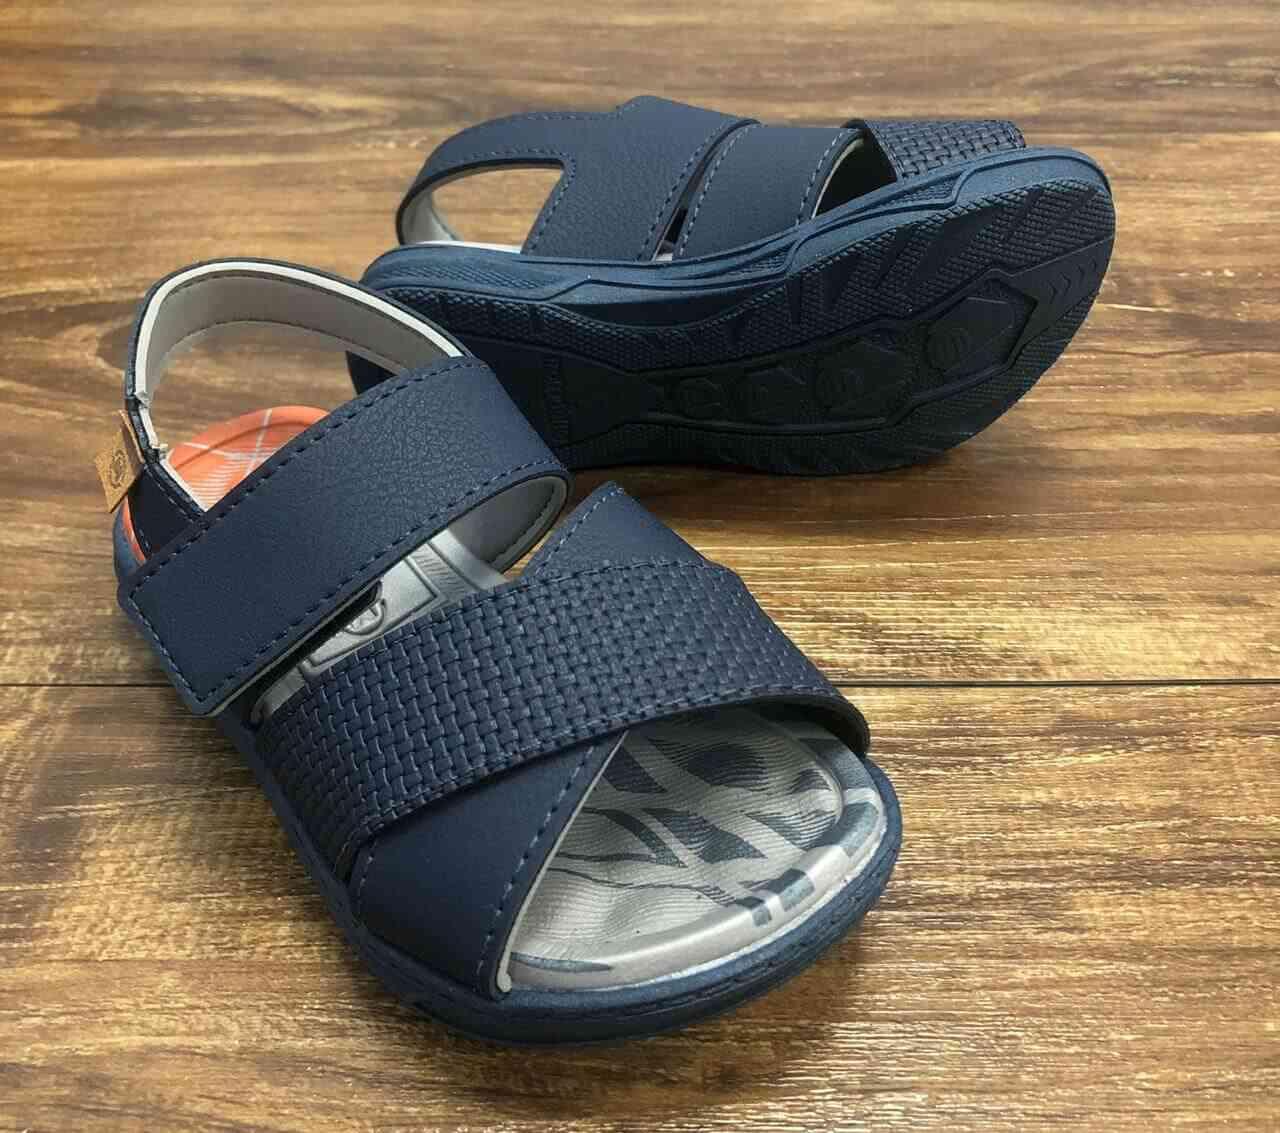 Sandalia Azul Marinho Cruzada Infantil